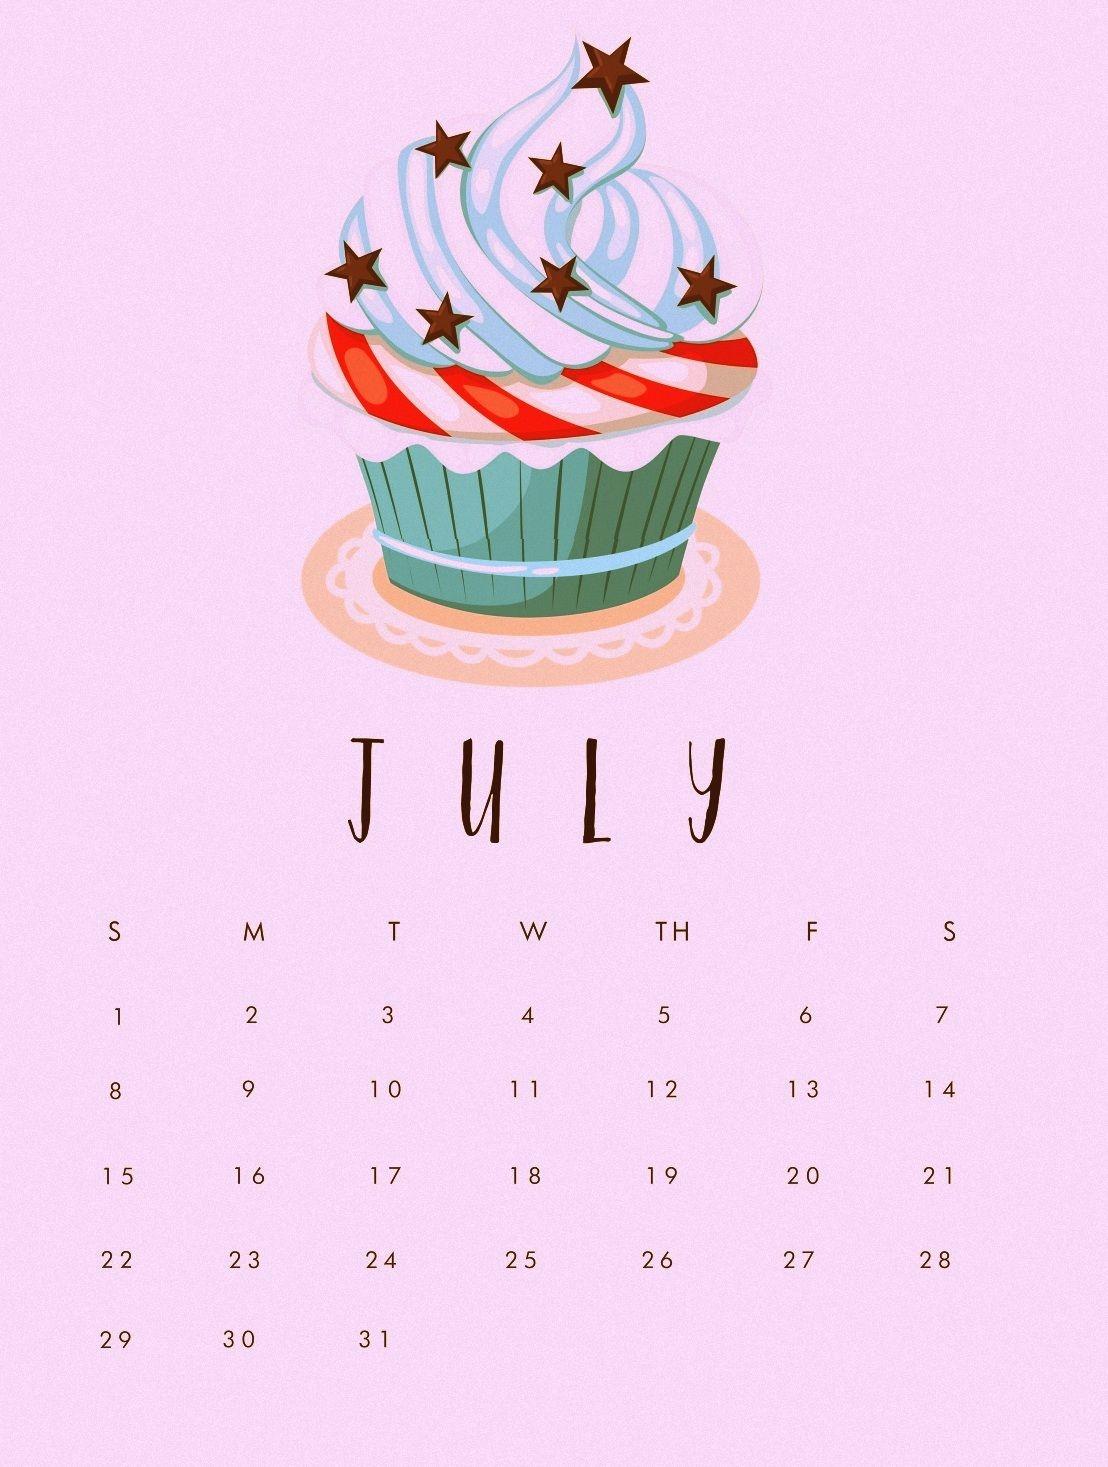 july 2022 calendar mobile wallpaper::July 2022 Calendar Wallpaper iPhone